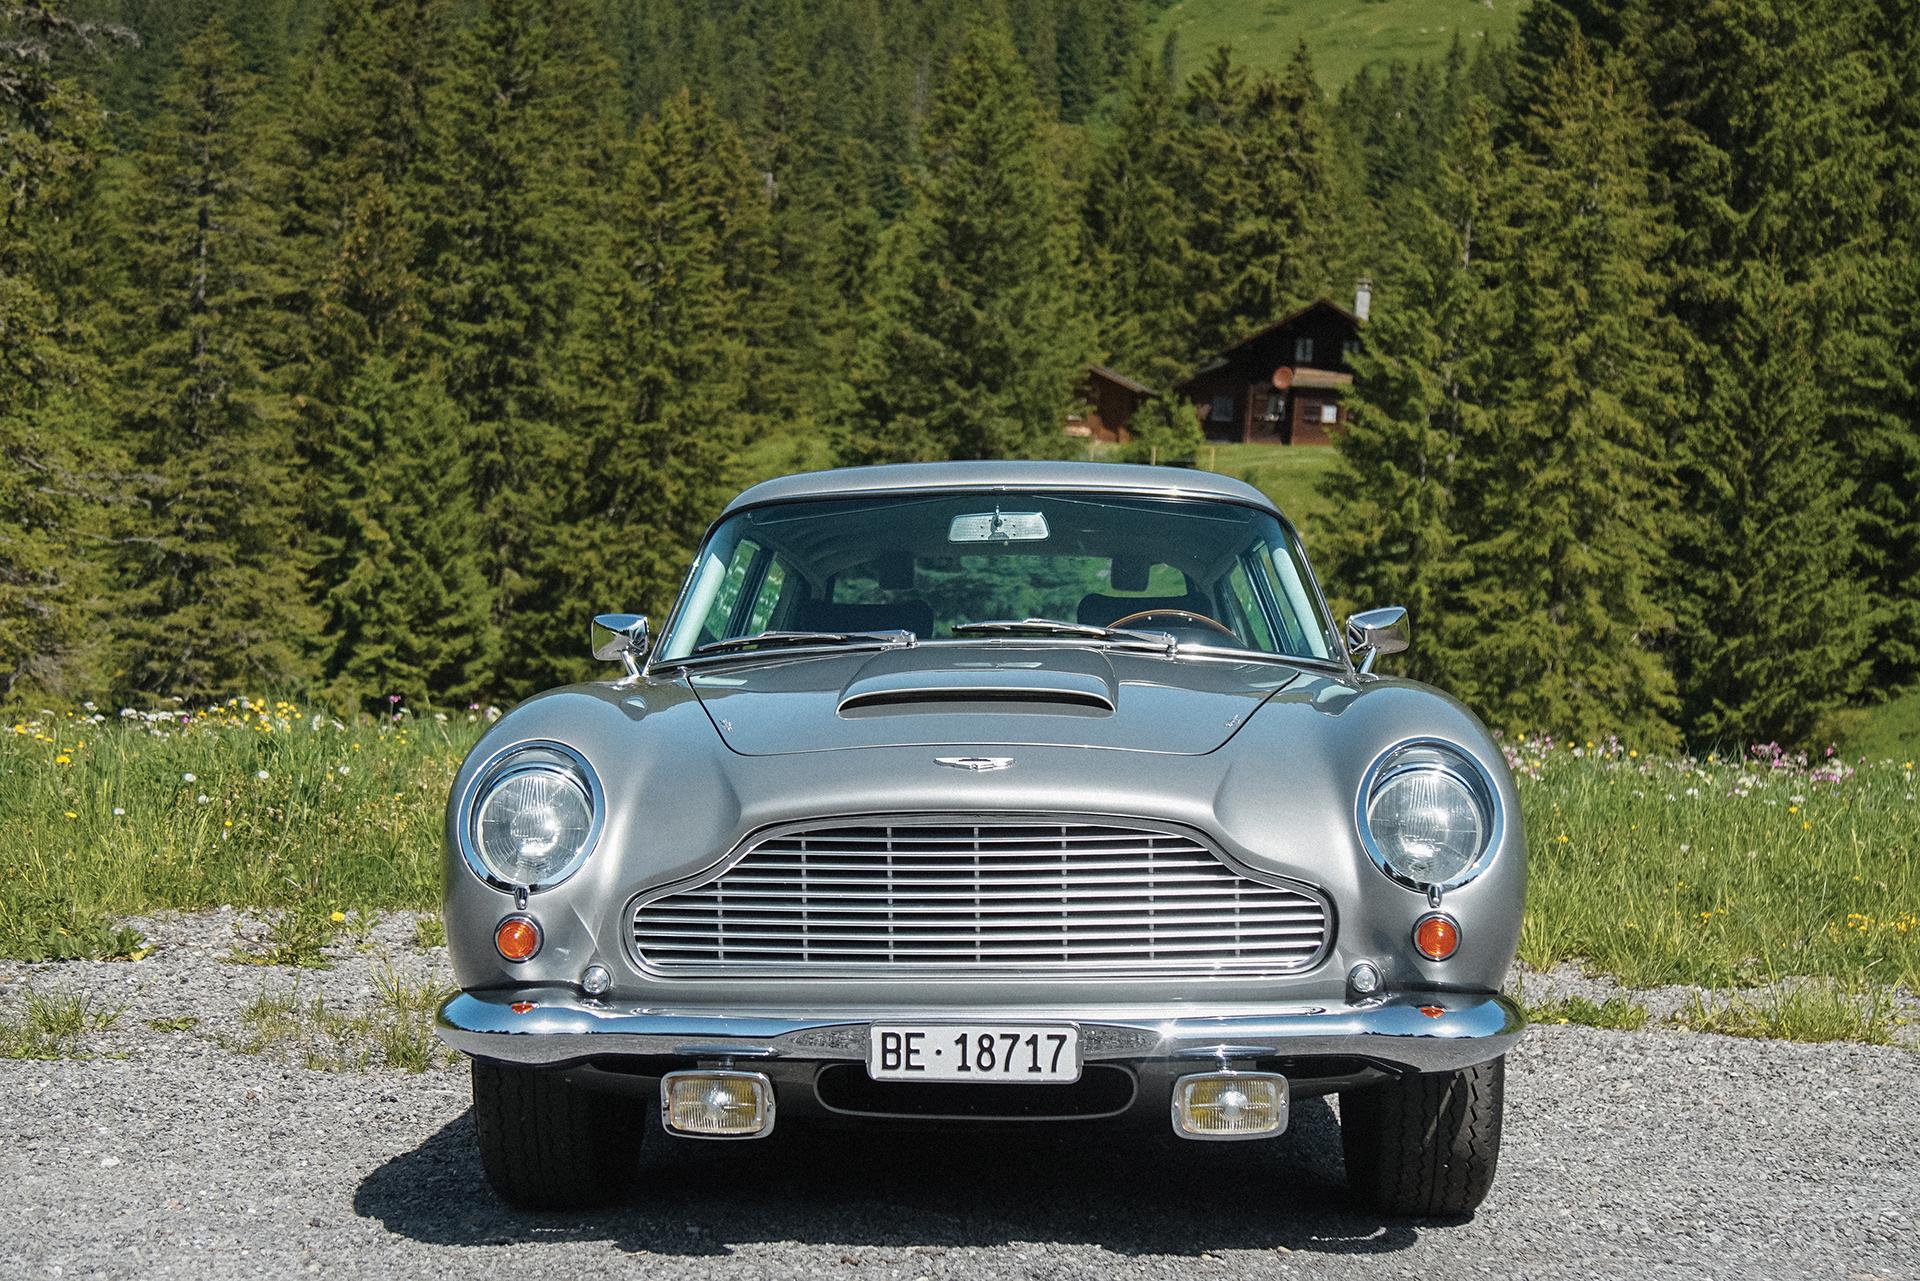 Brown Beats Bond The Classic Car Trust